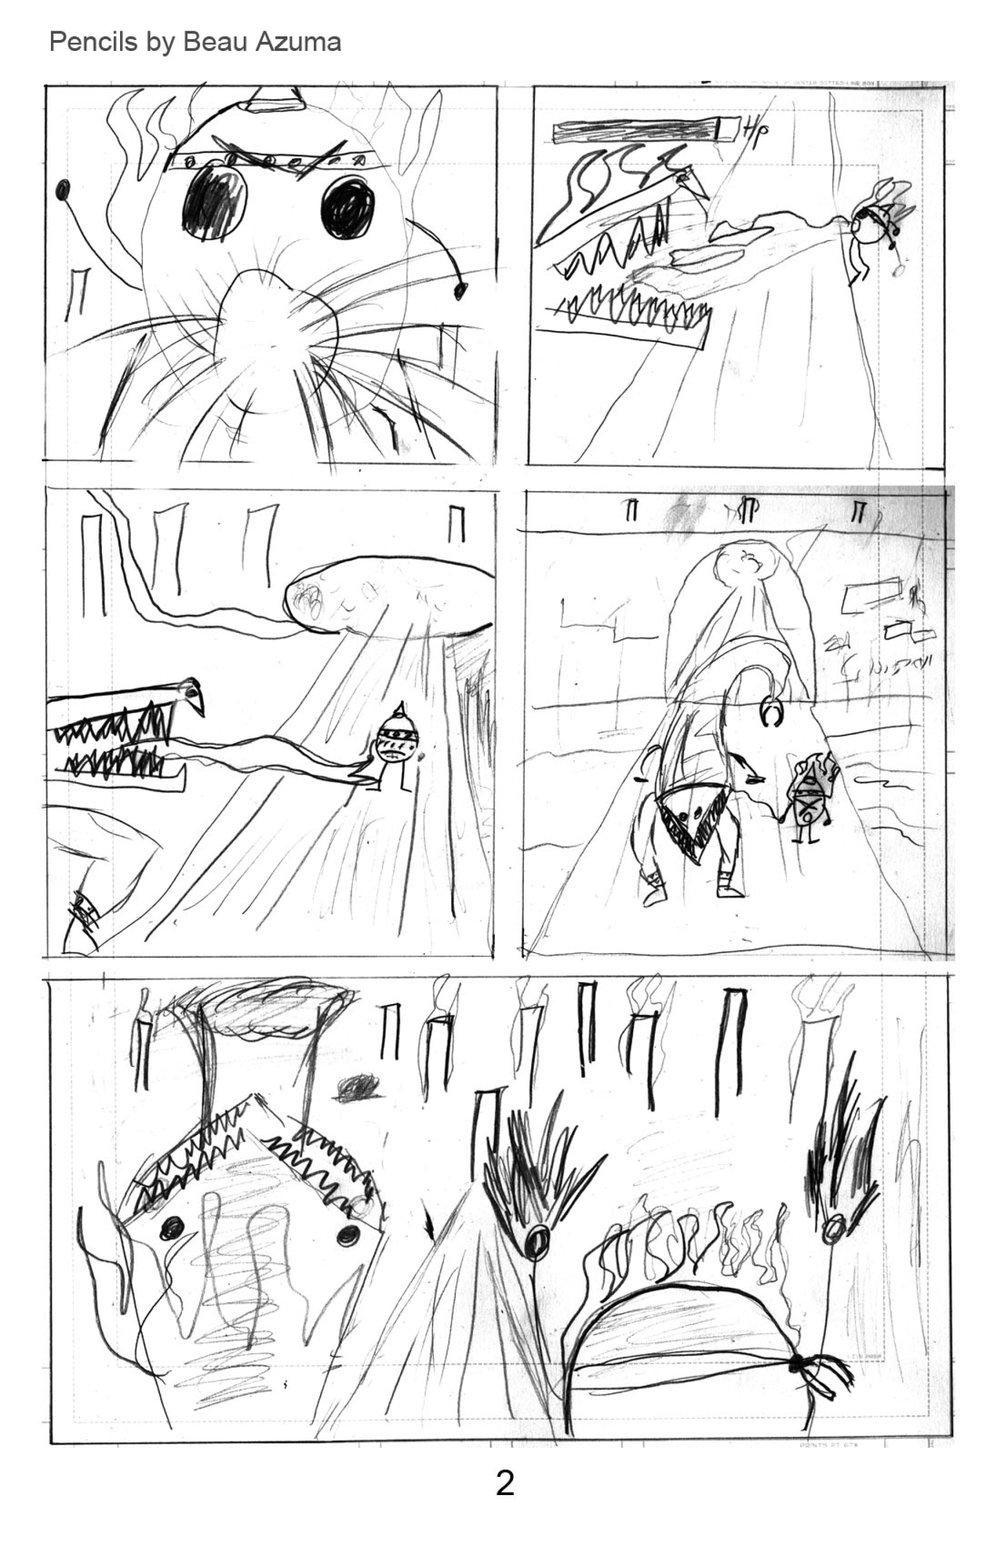 ev page 2.jpg